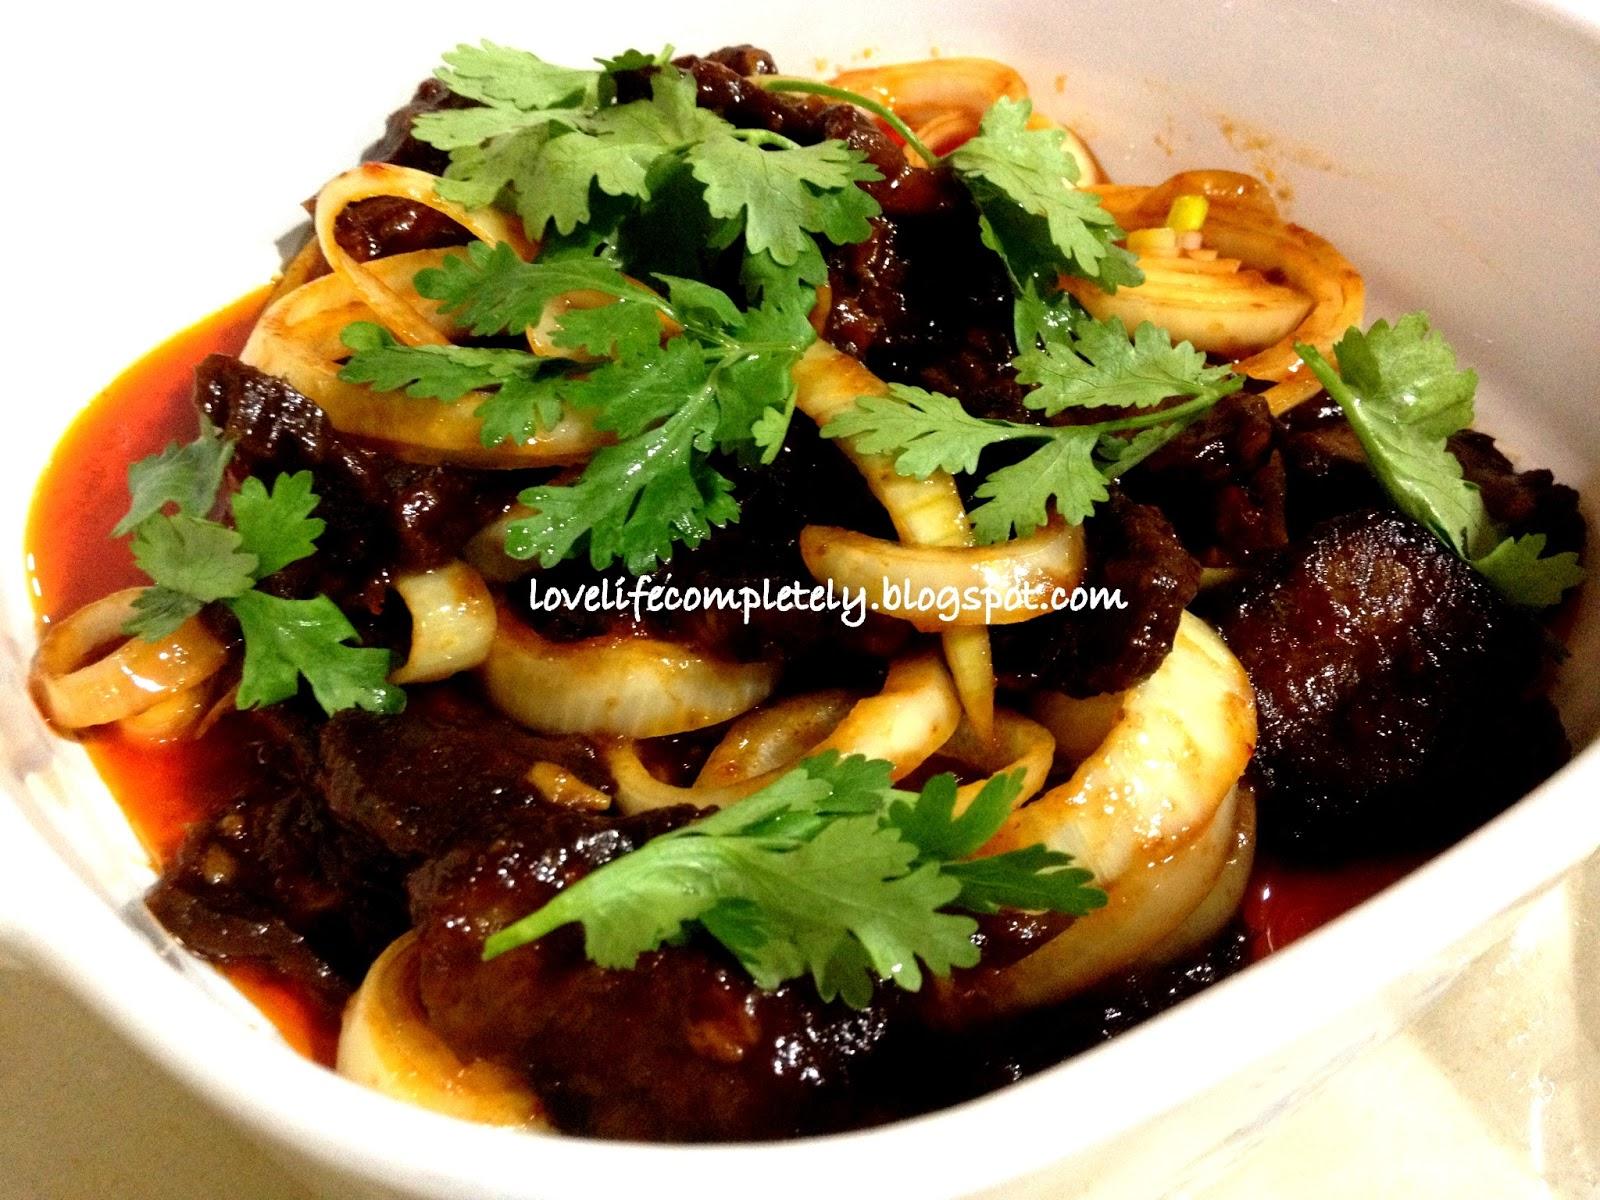 Ayam masak merah recipe - HungryGoWhere Singapore